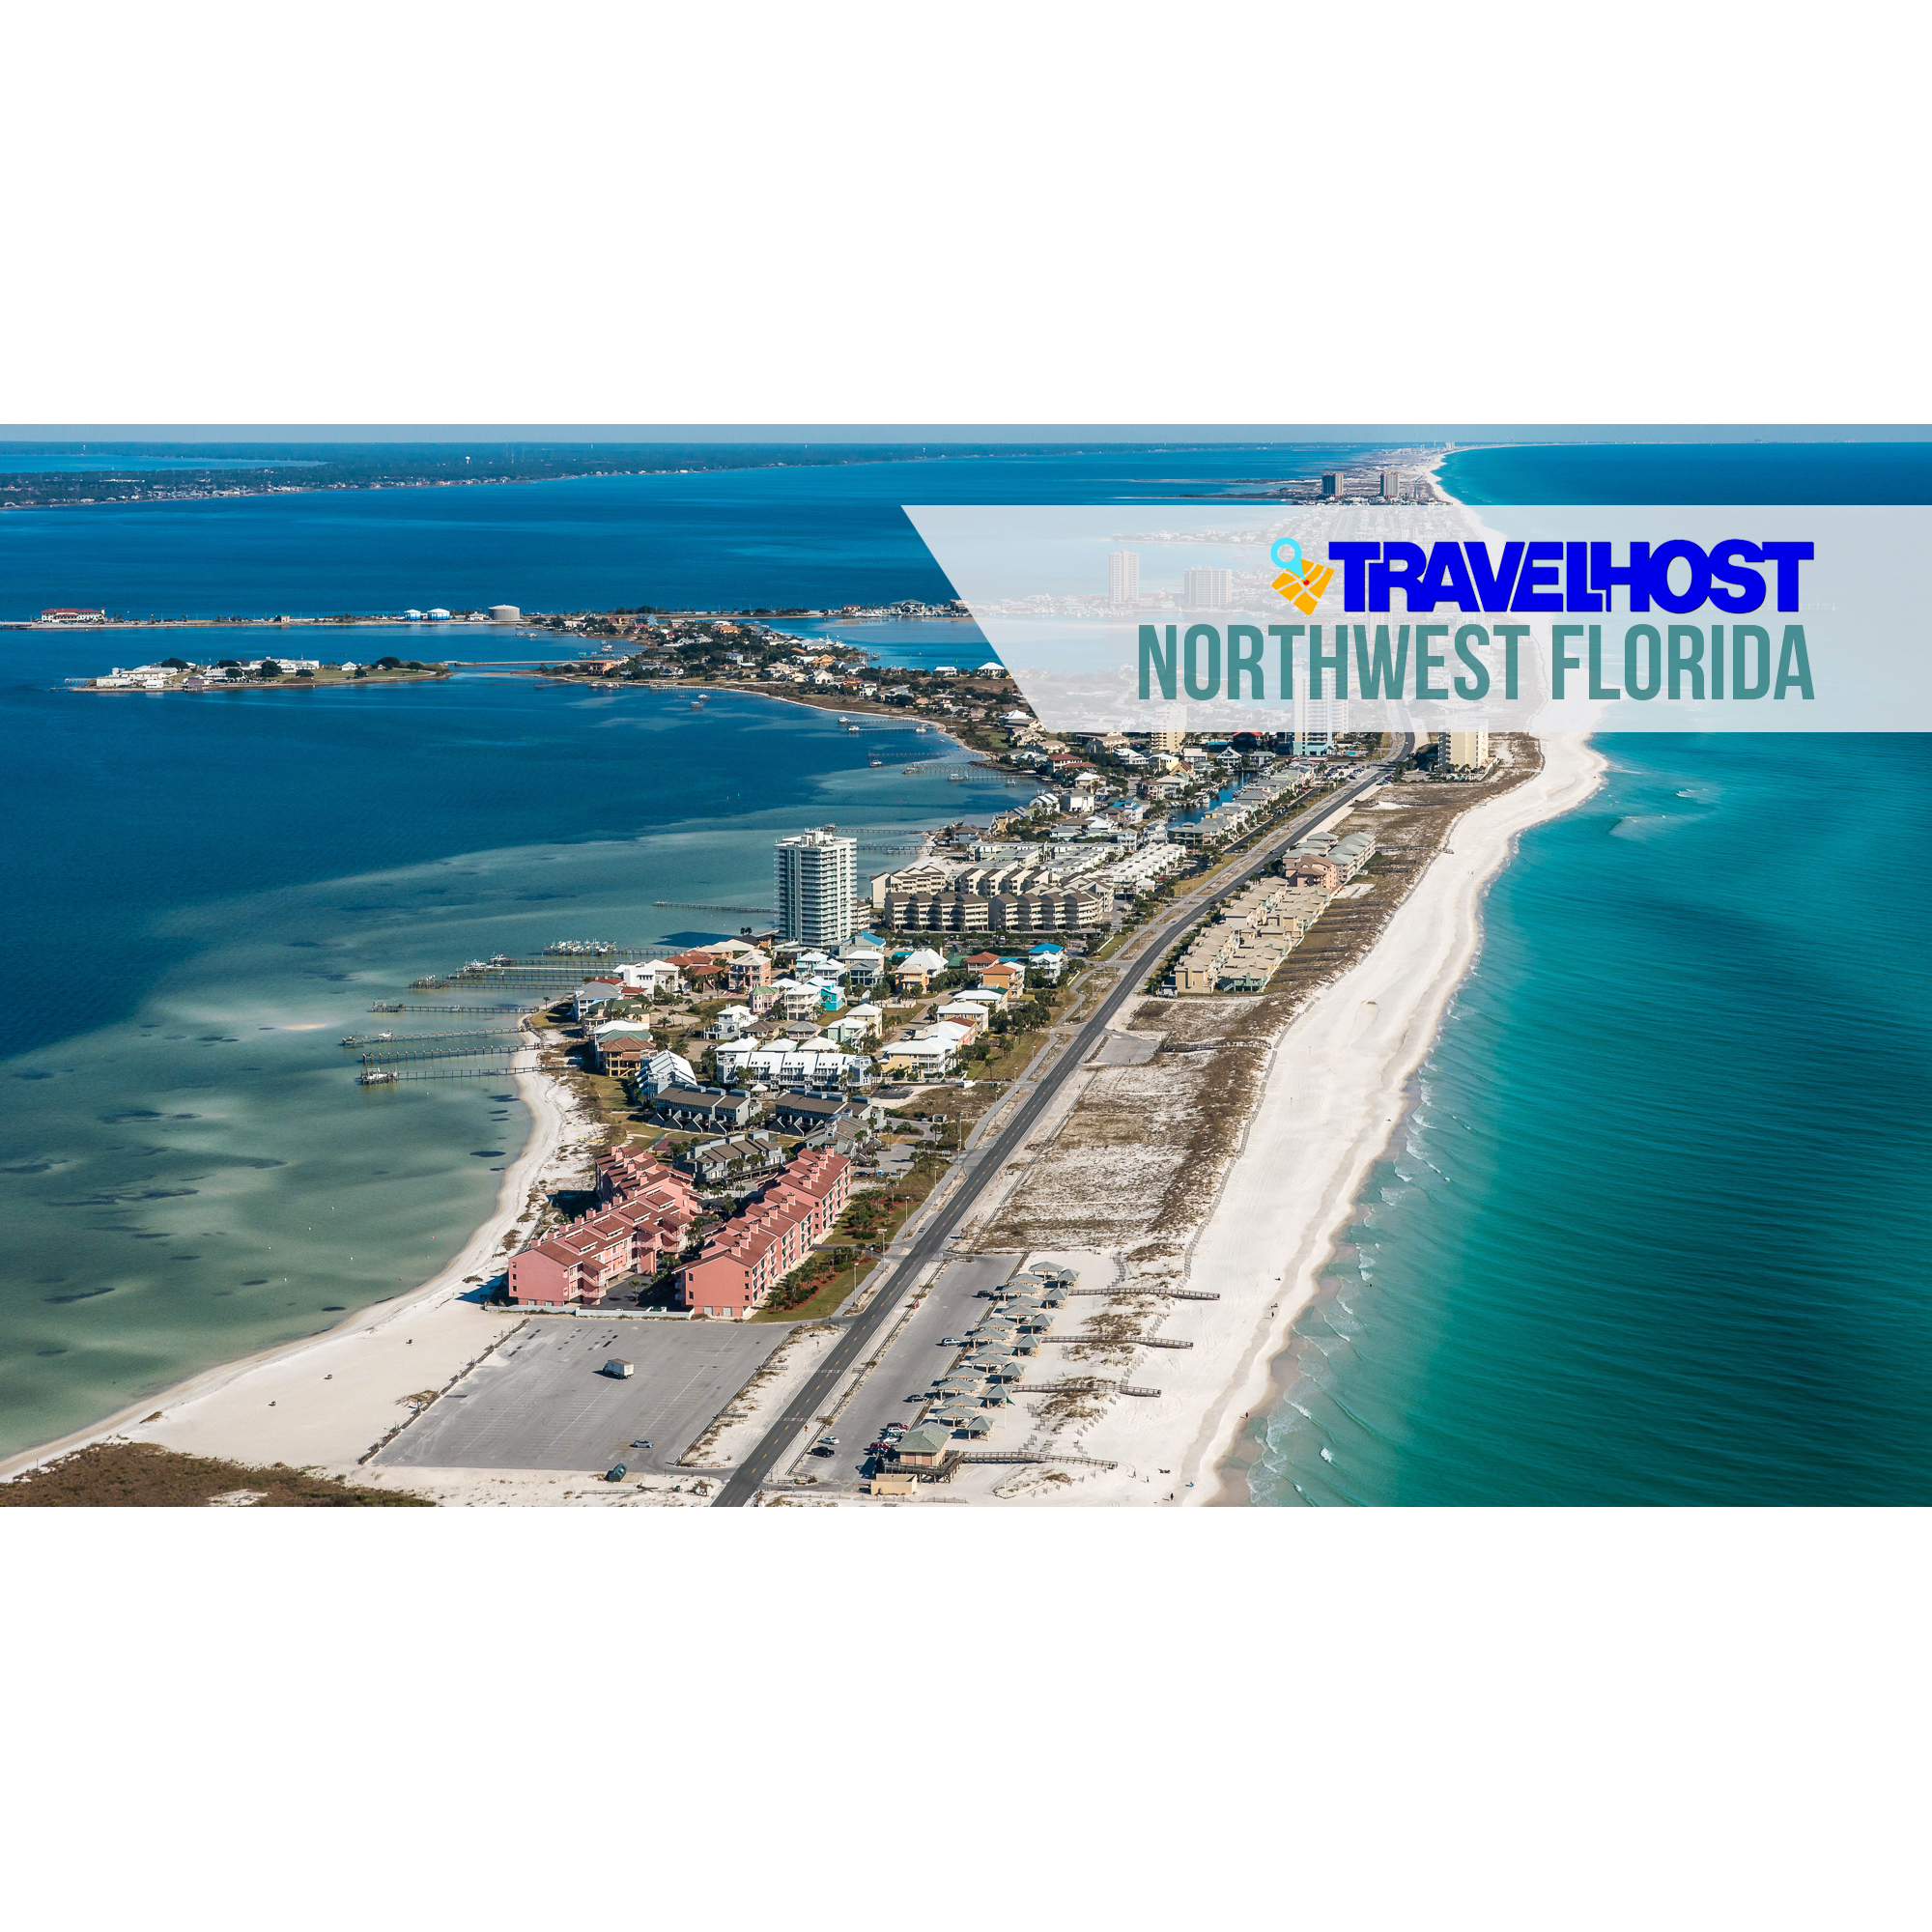 TravelHost of Northwest Florida